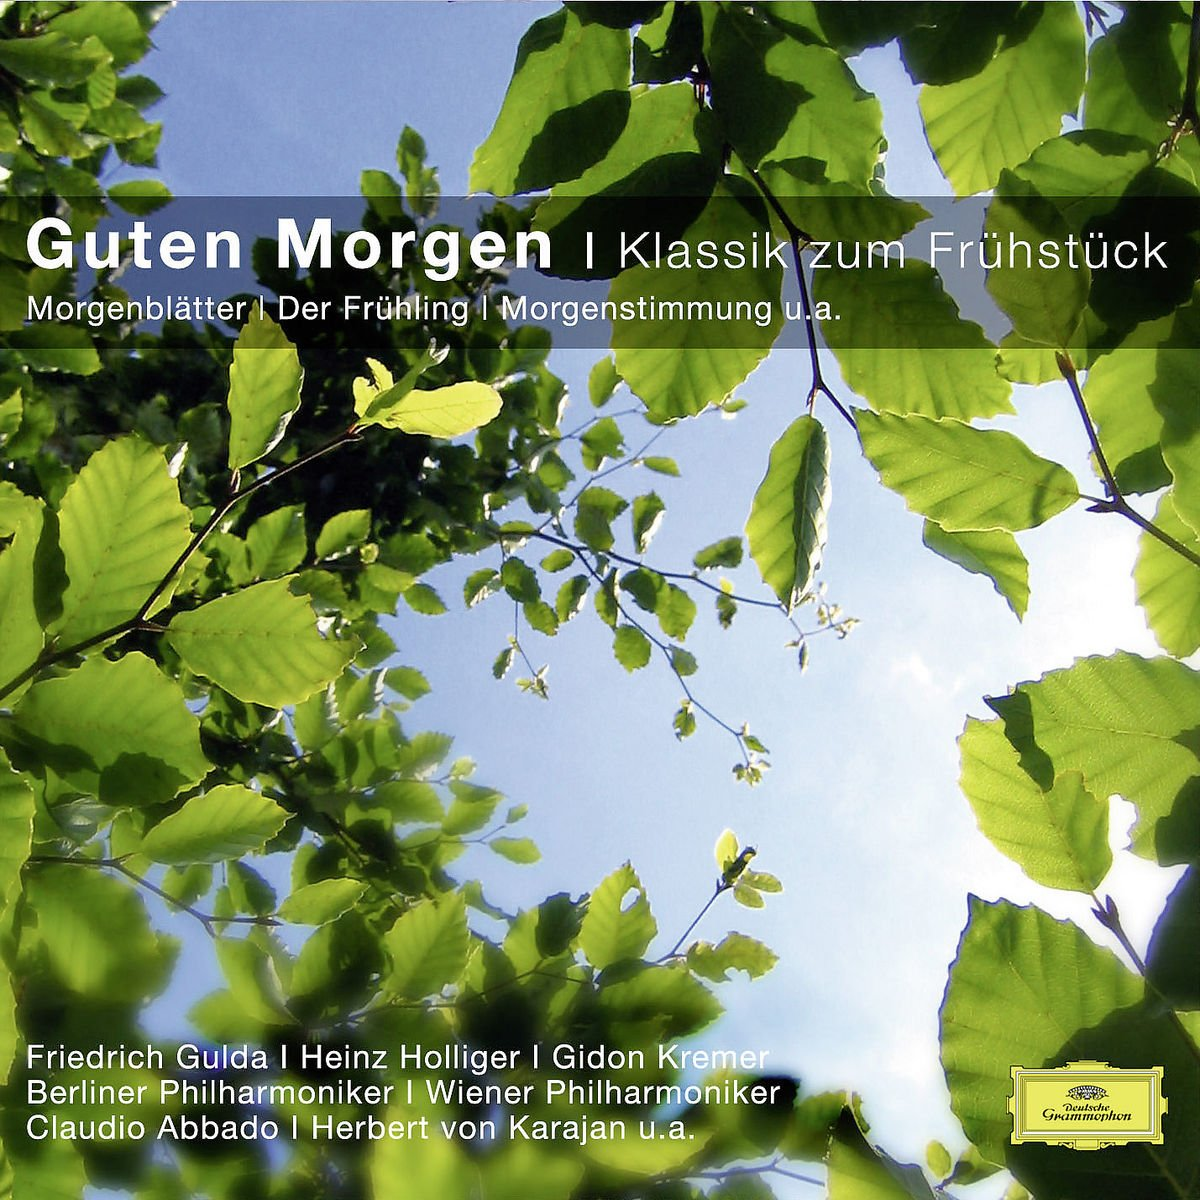 Exquisit Guten Morgen Frühstück Ideen Von Classical Choice: - Klassik Z.frühstück: Concept.co.uk: Music